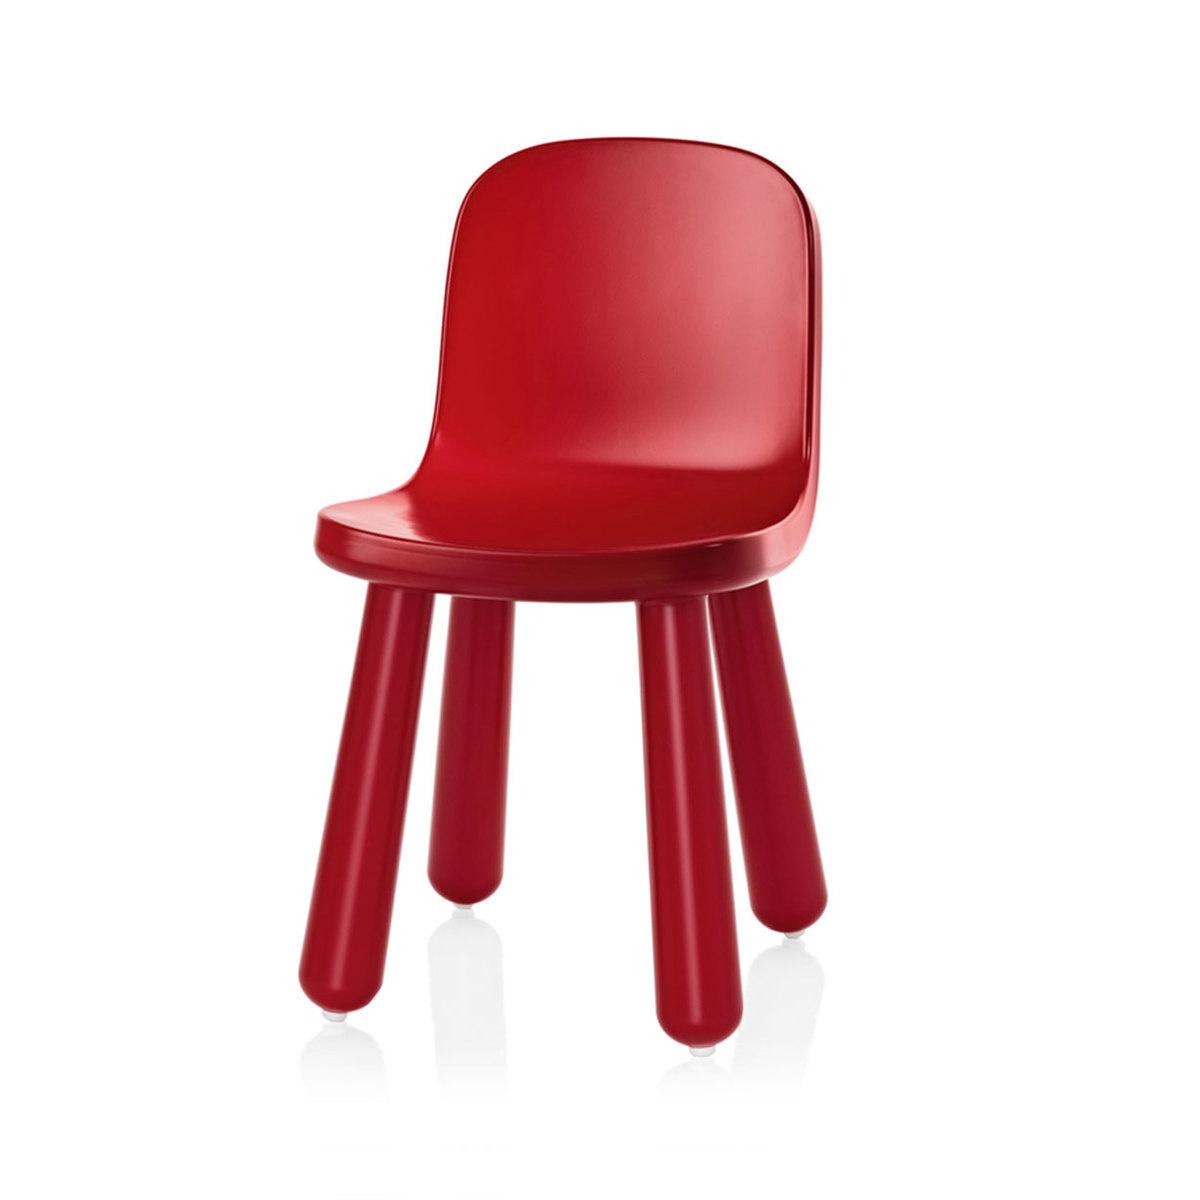 Missoni Home Outdoor Folding Chair Regista: Still Chair By Magis